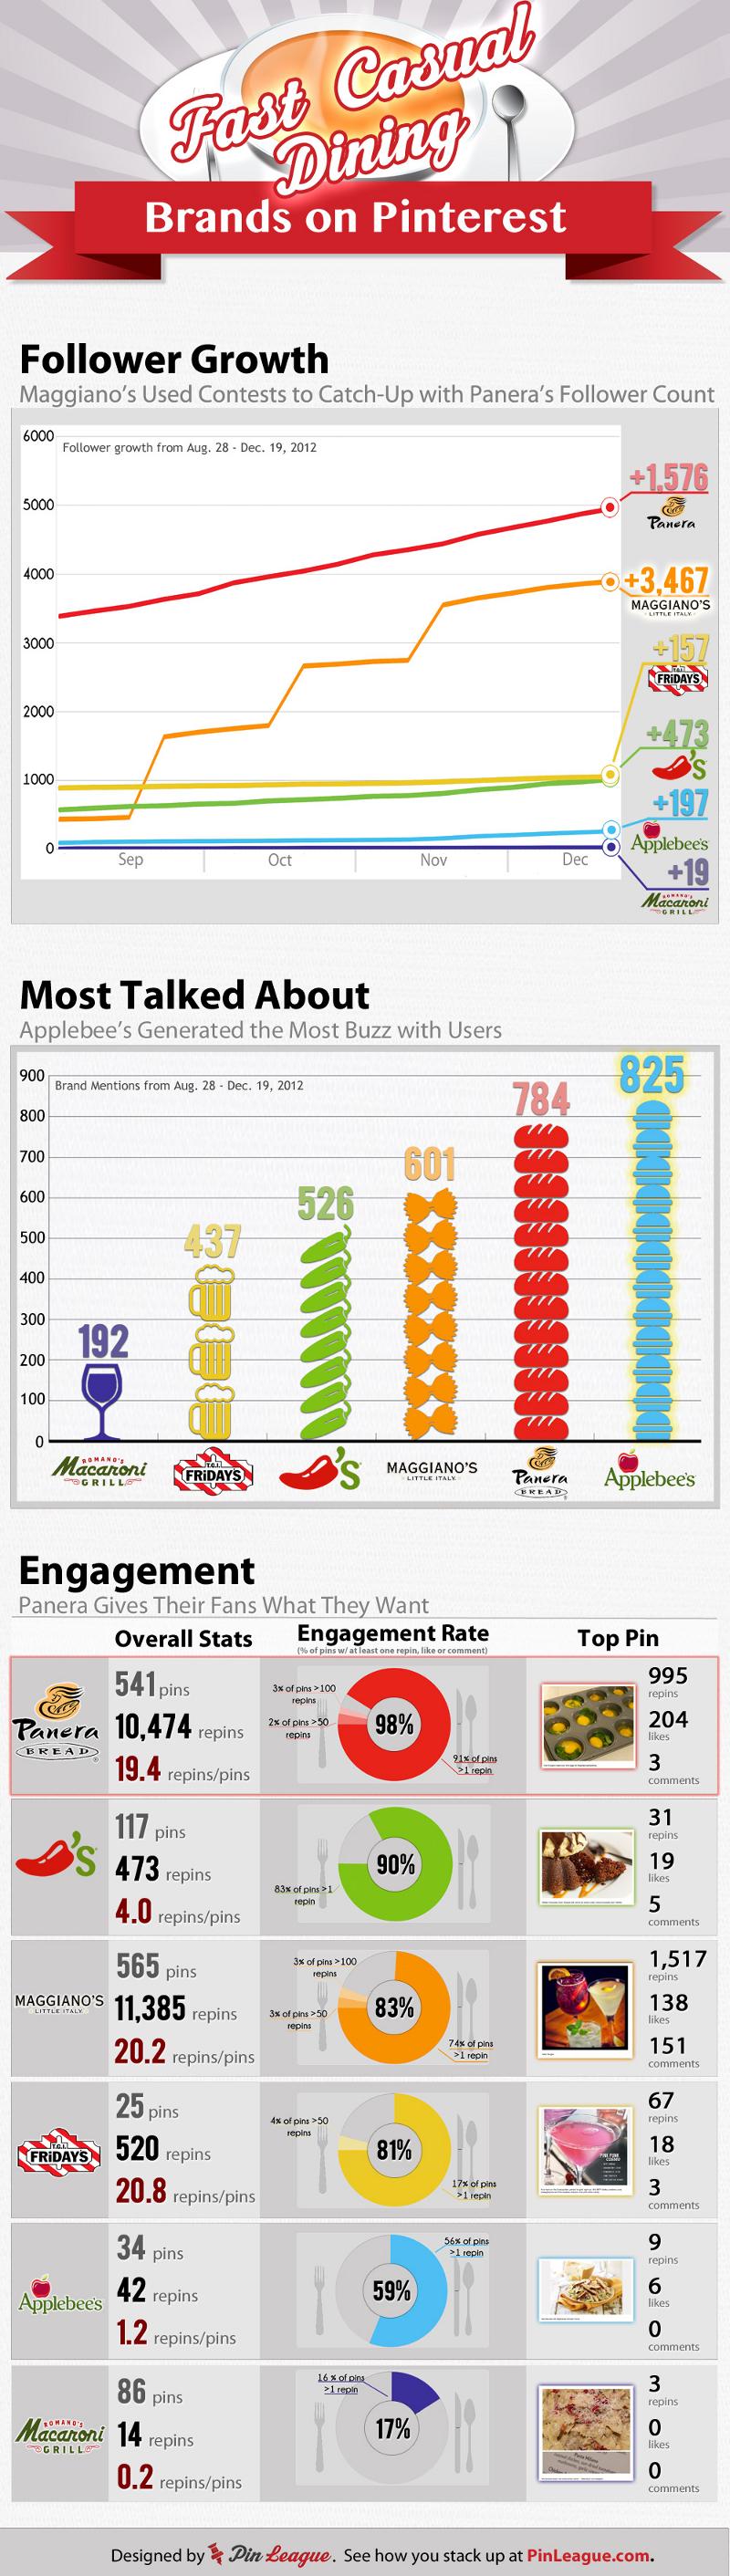 13 Pinterest Engagement Rate Stats for Top Restaurant Brands